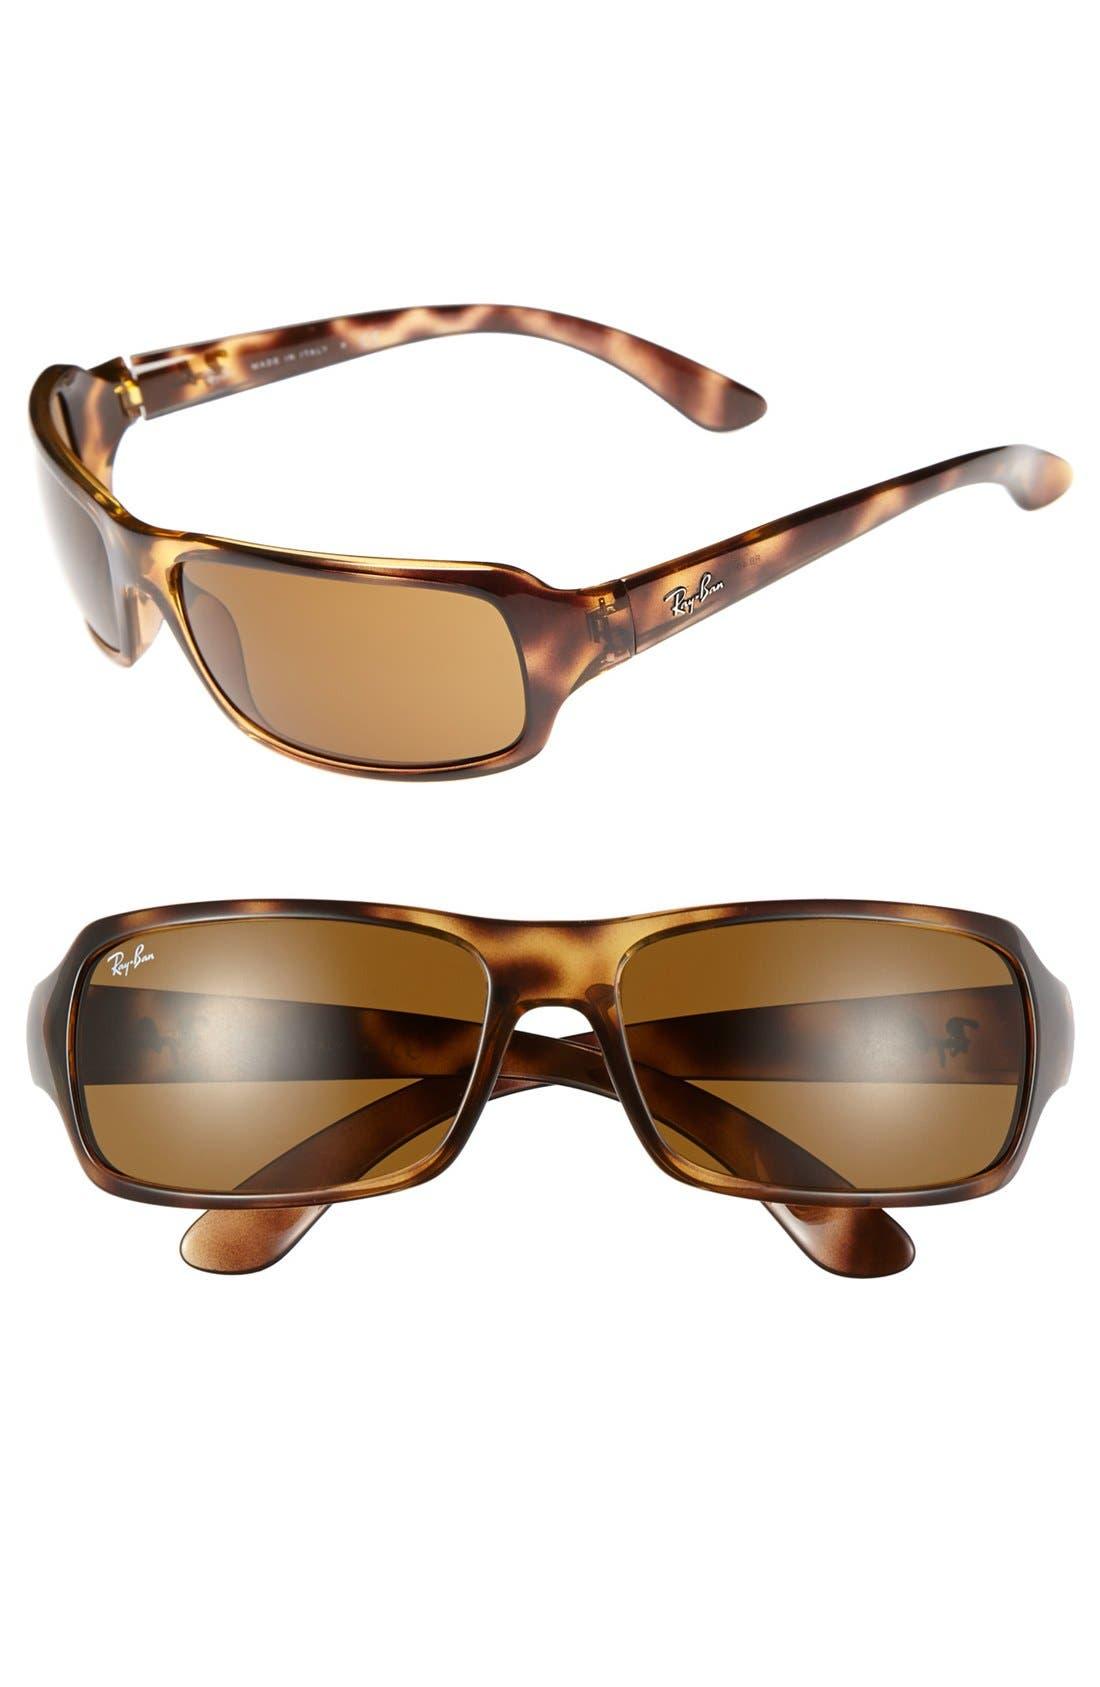 Alternate Image 1 Selected - Ray-Ban 61mm Wrap Sunglasses